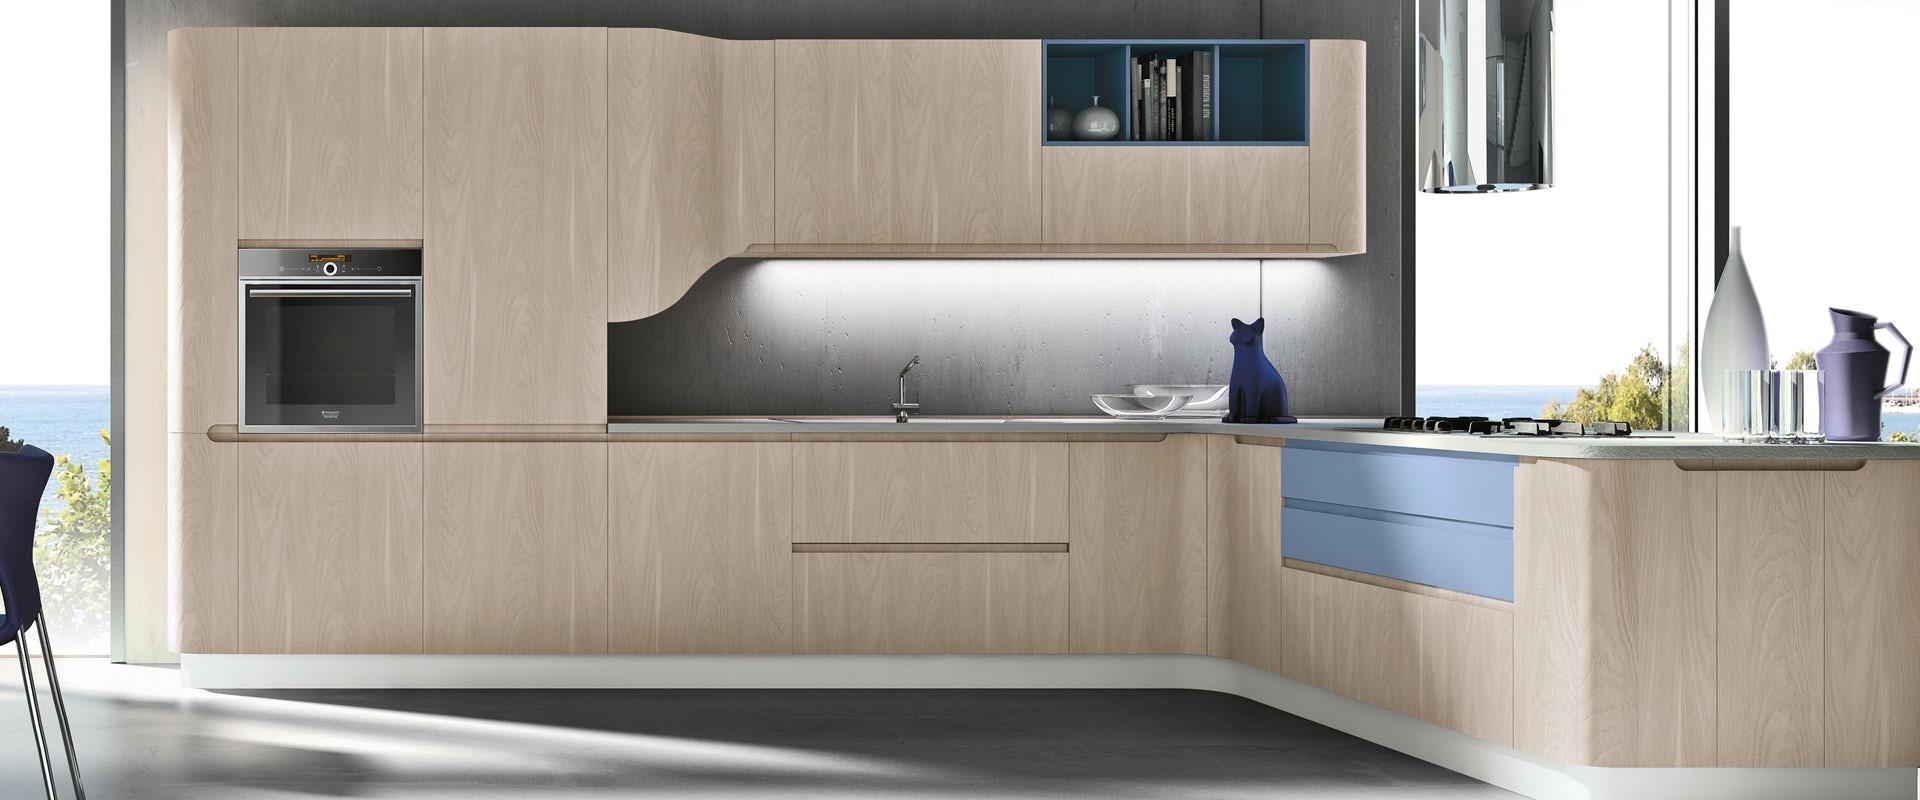 stosa-cucine-moderne-bring-86.jpg